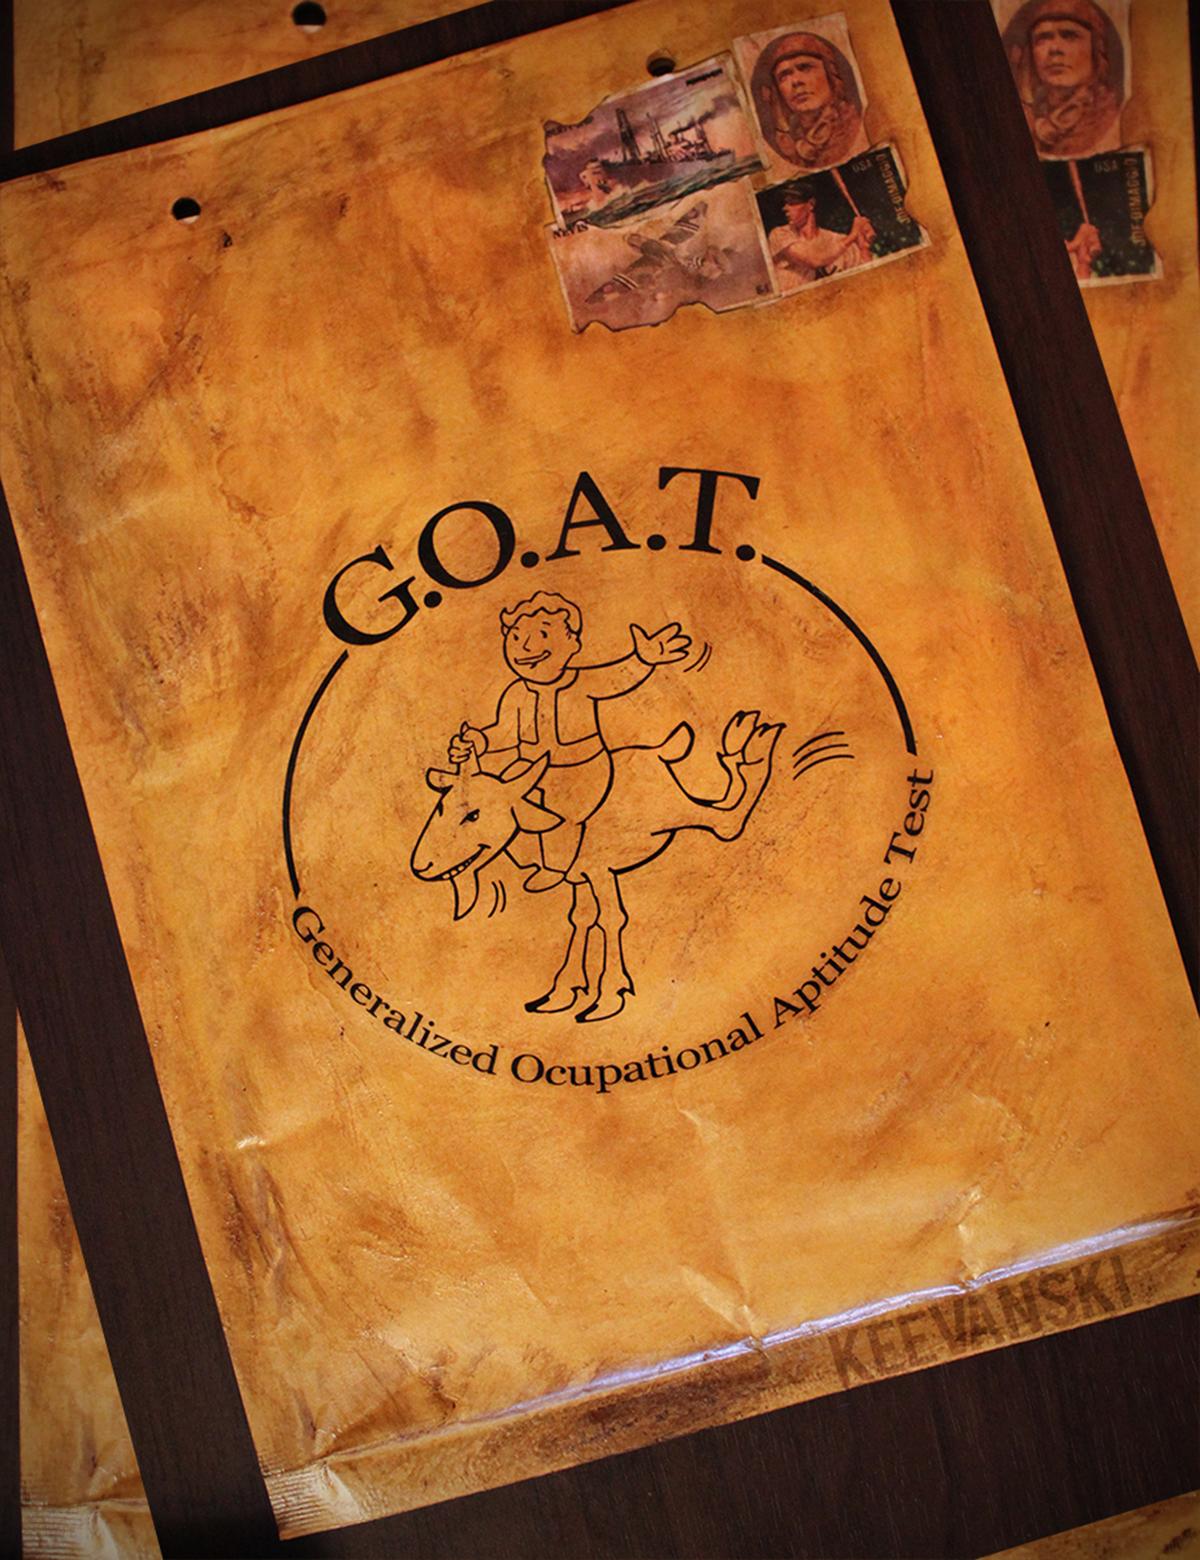 goat-fallout3-keevanski